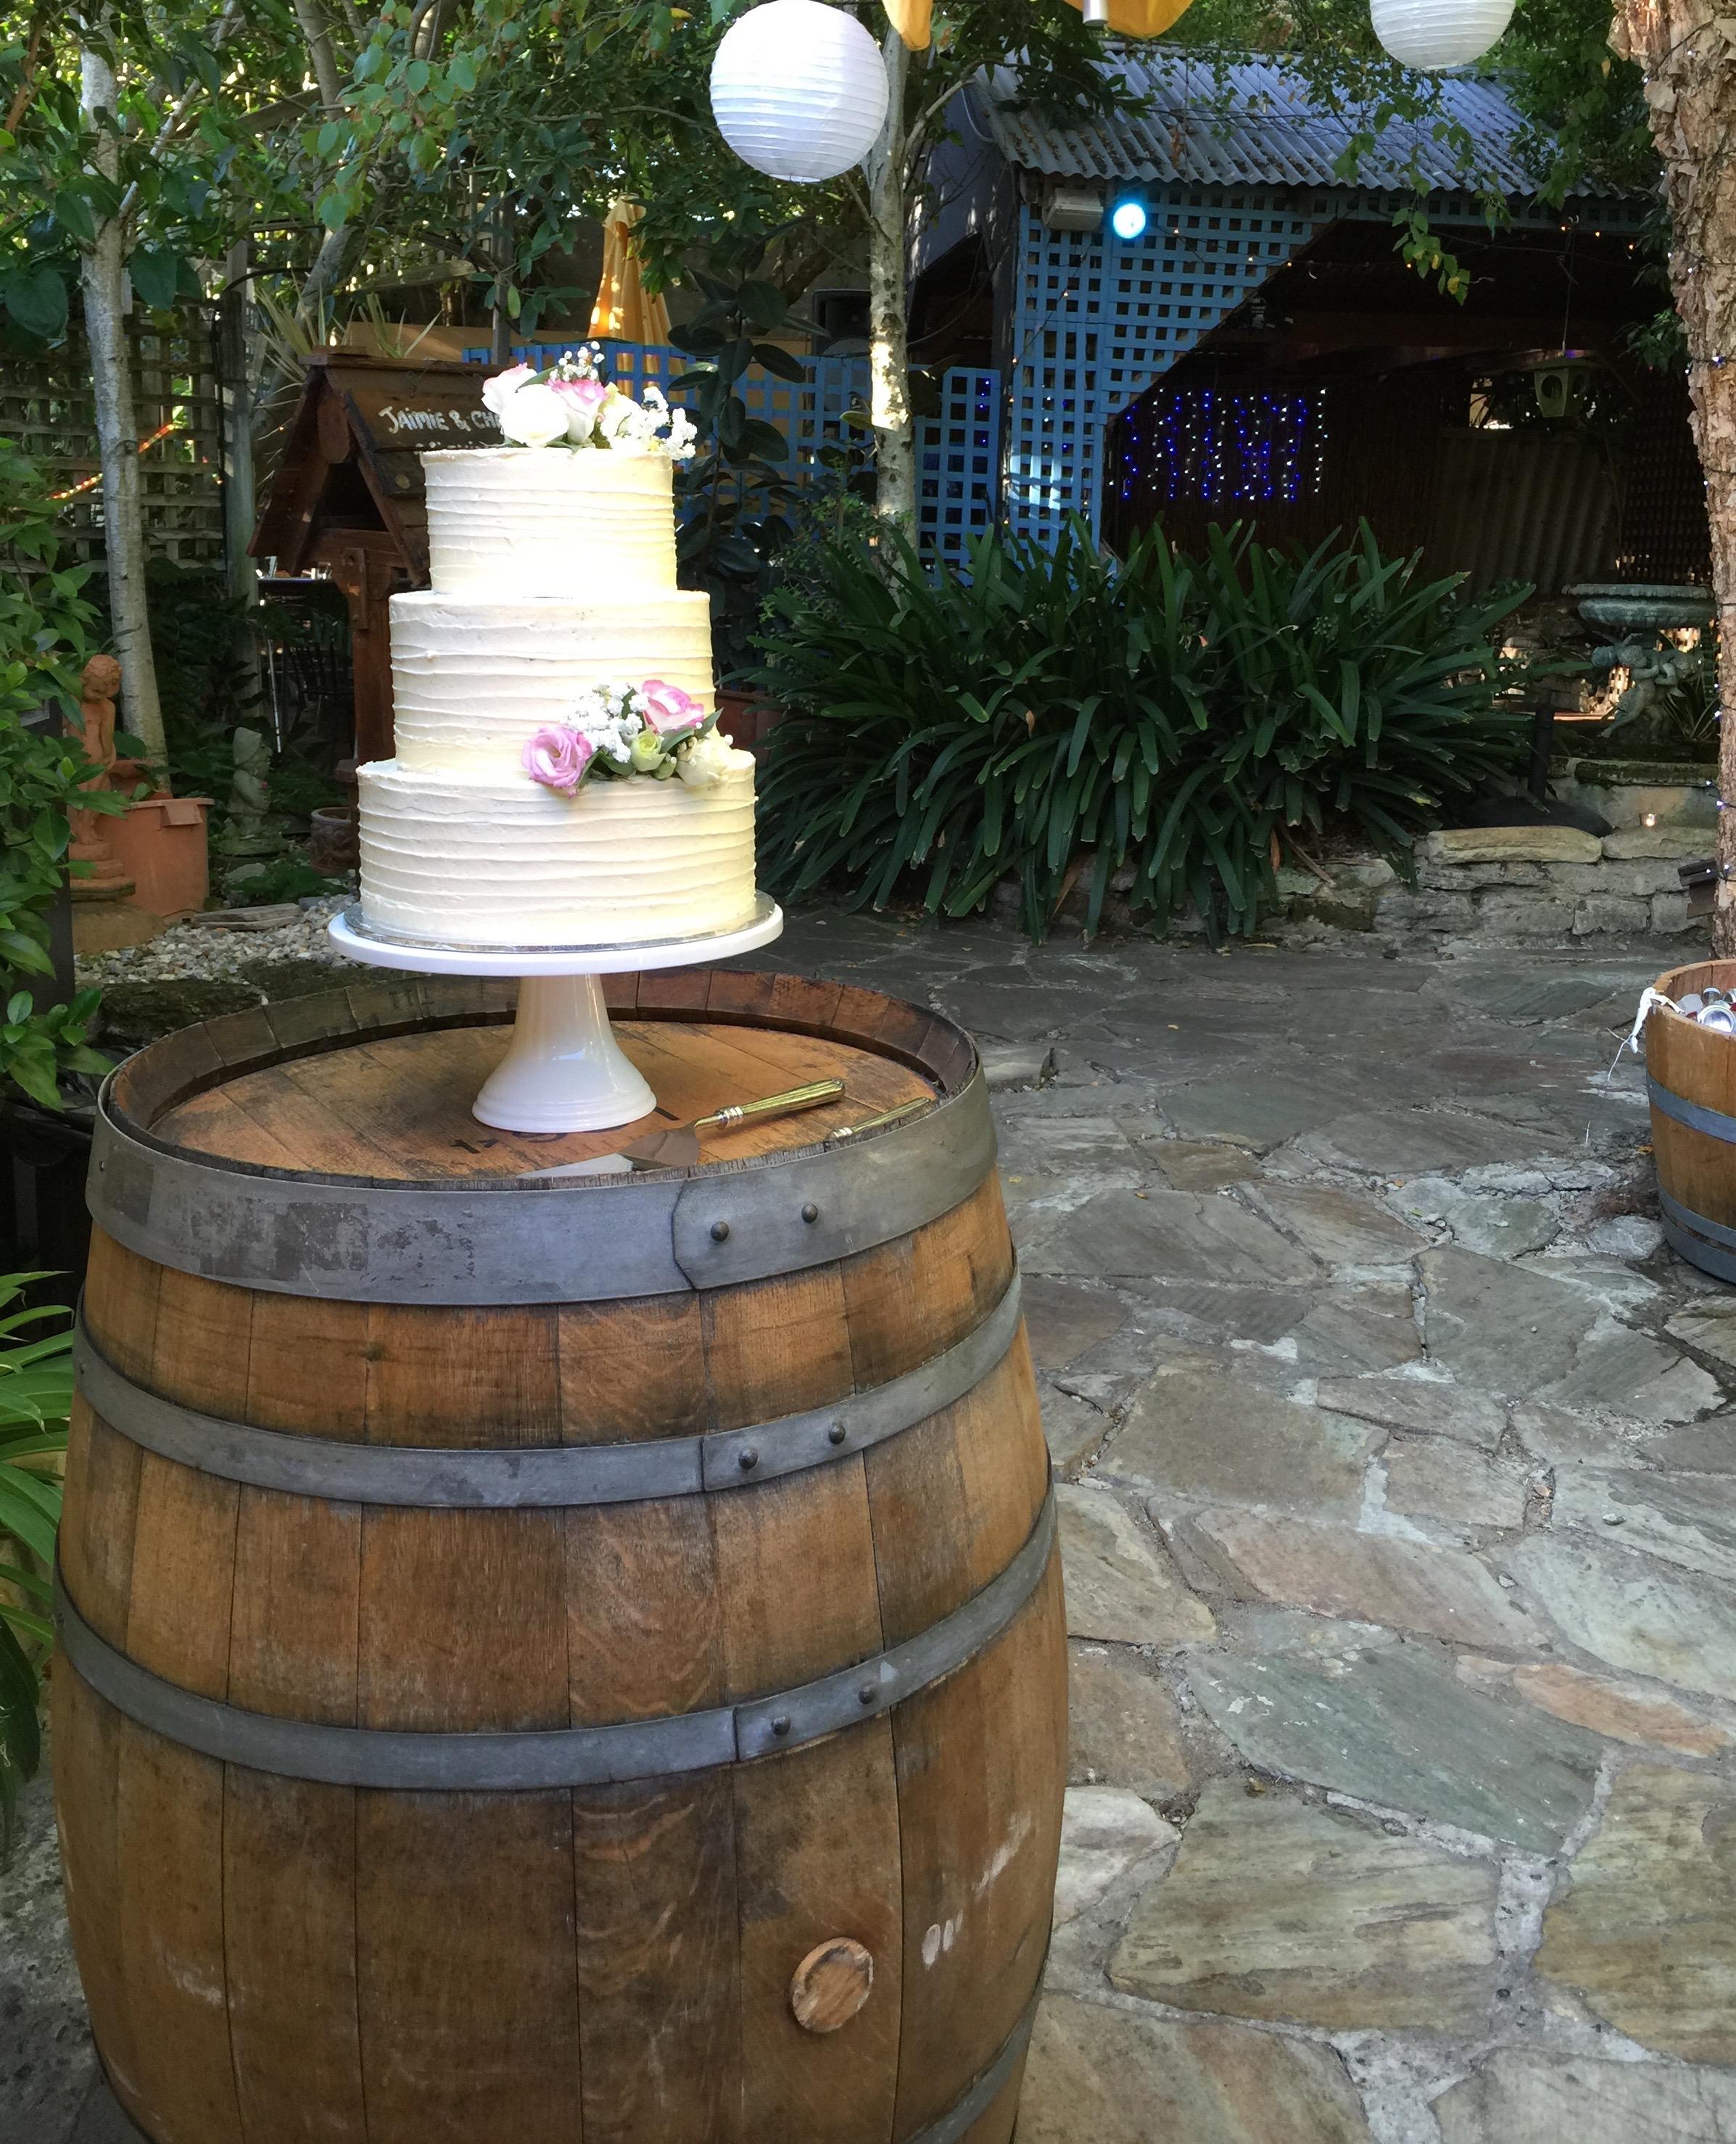 cake on barrel.jpg